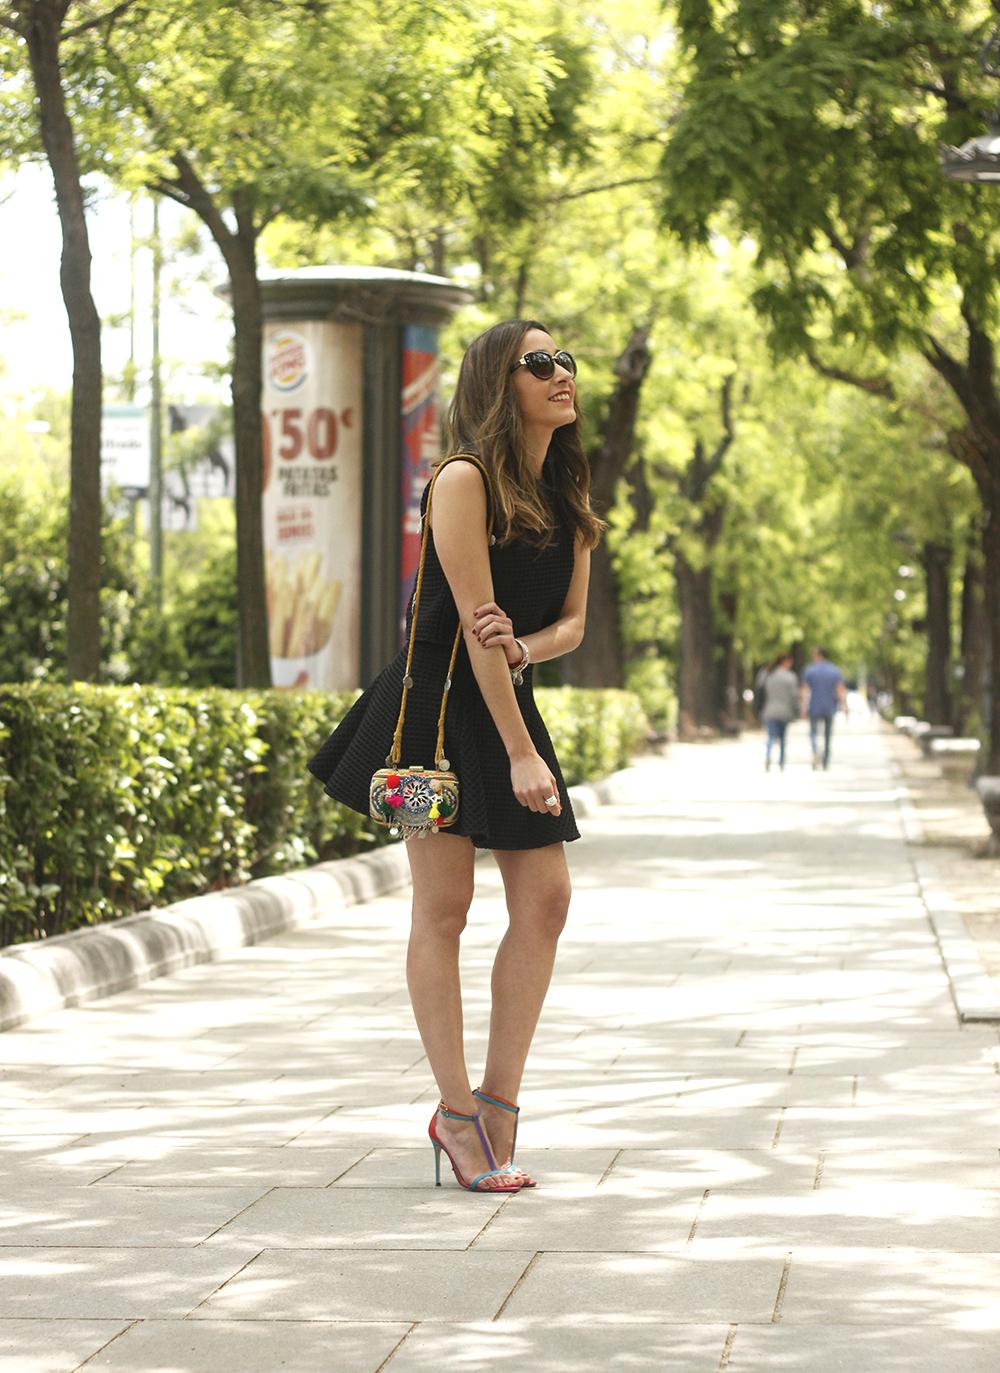 Little black dress maje carolina herrera sandals bag outfit fashion style summer sunnies10